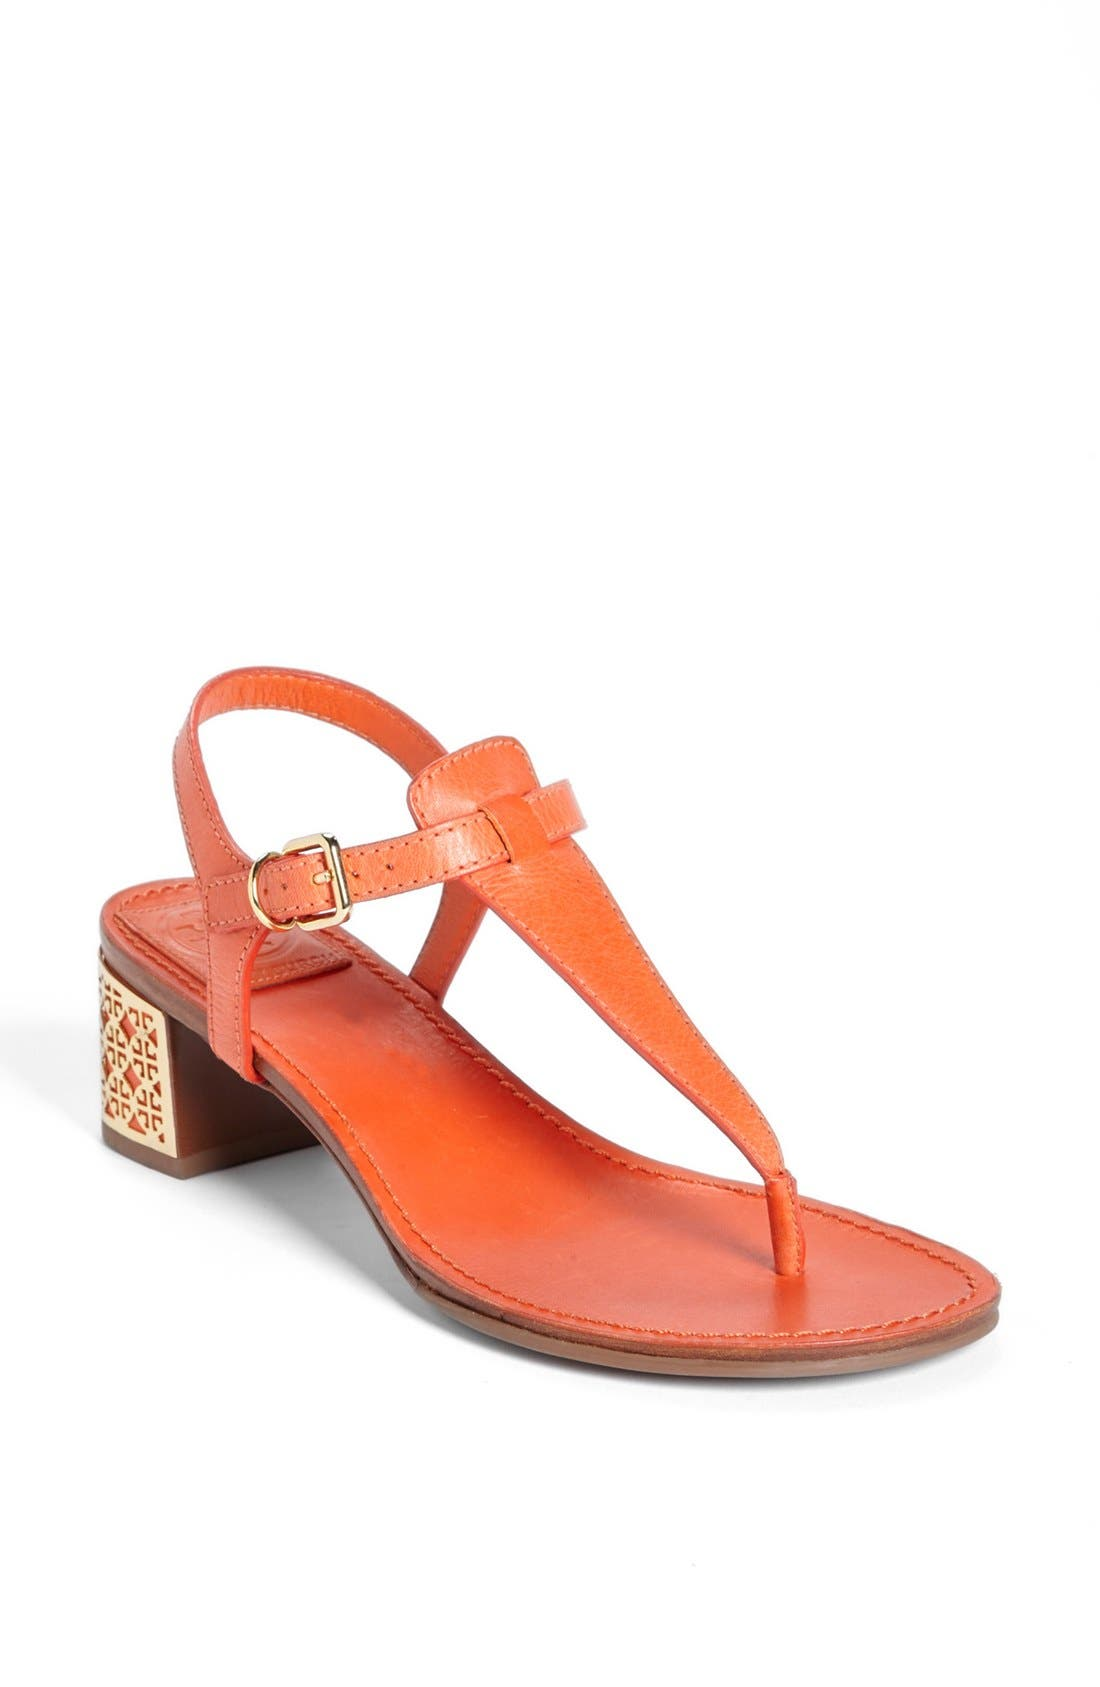 Alternate Image 1 Selected - Tory Burch 'Audra' Sandal